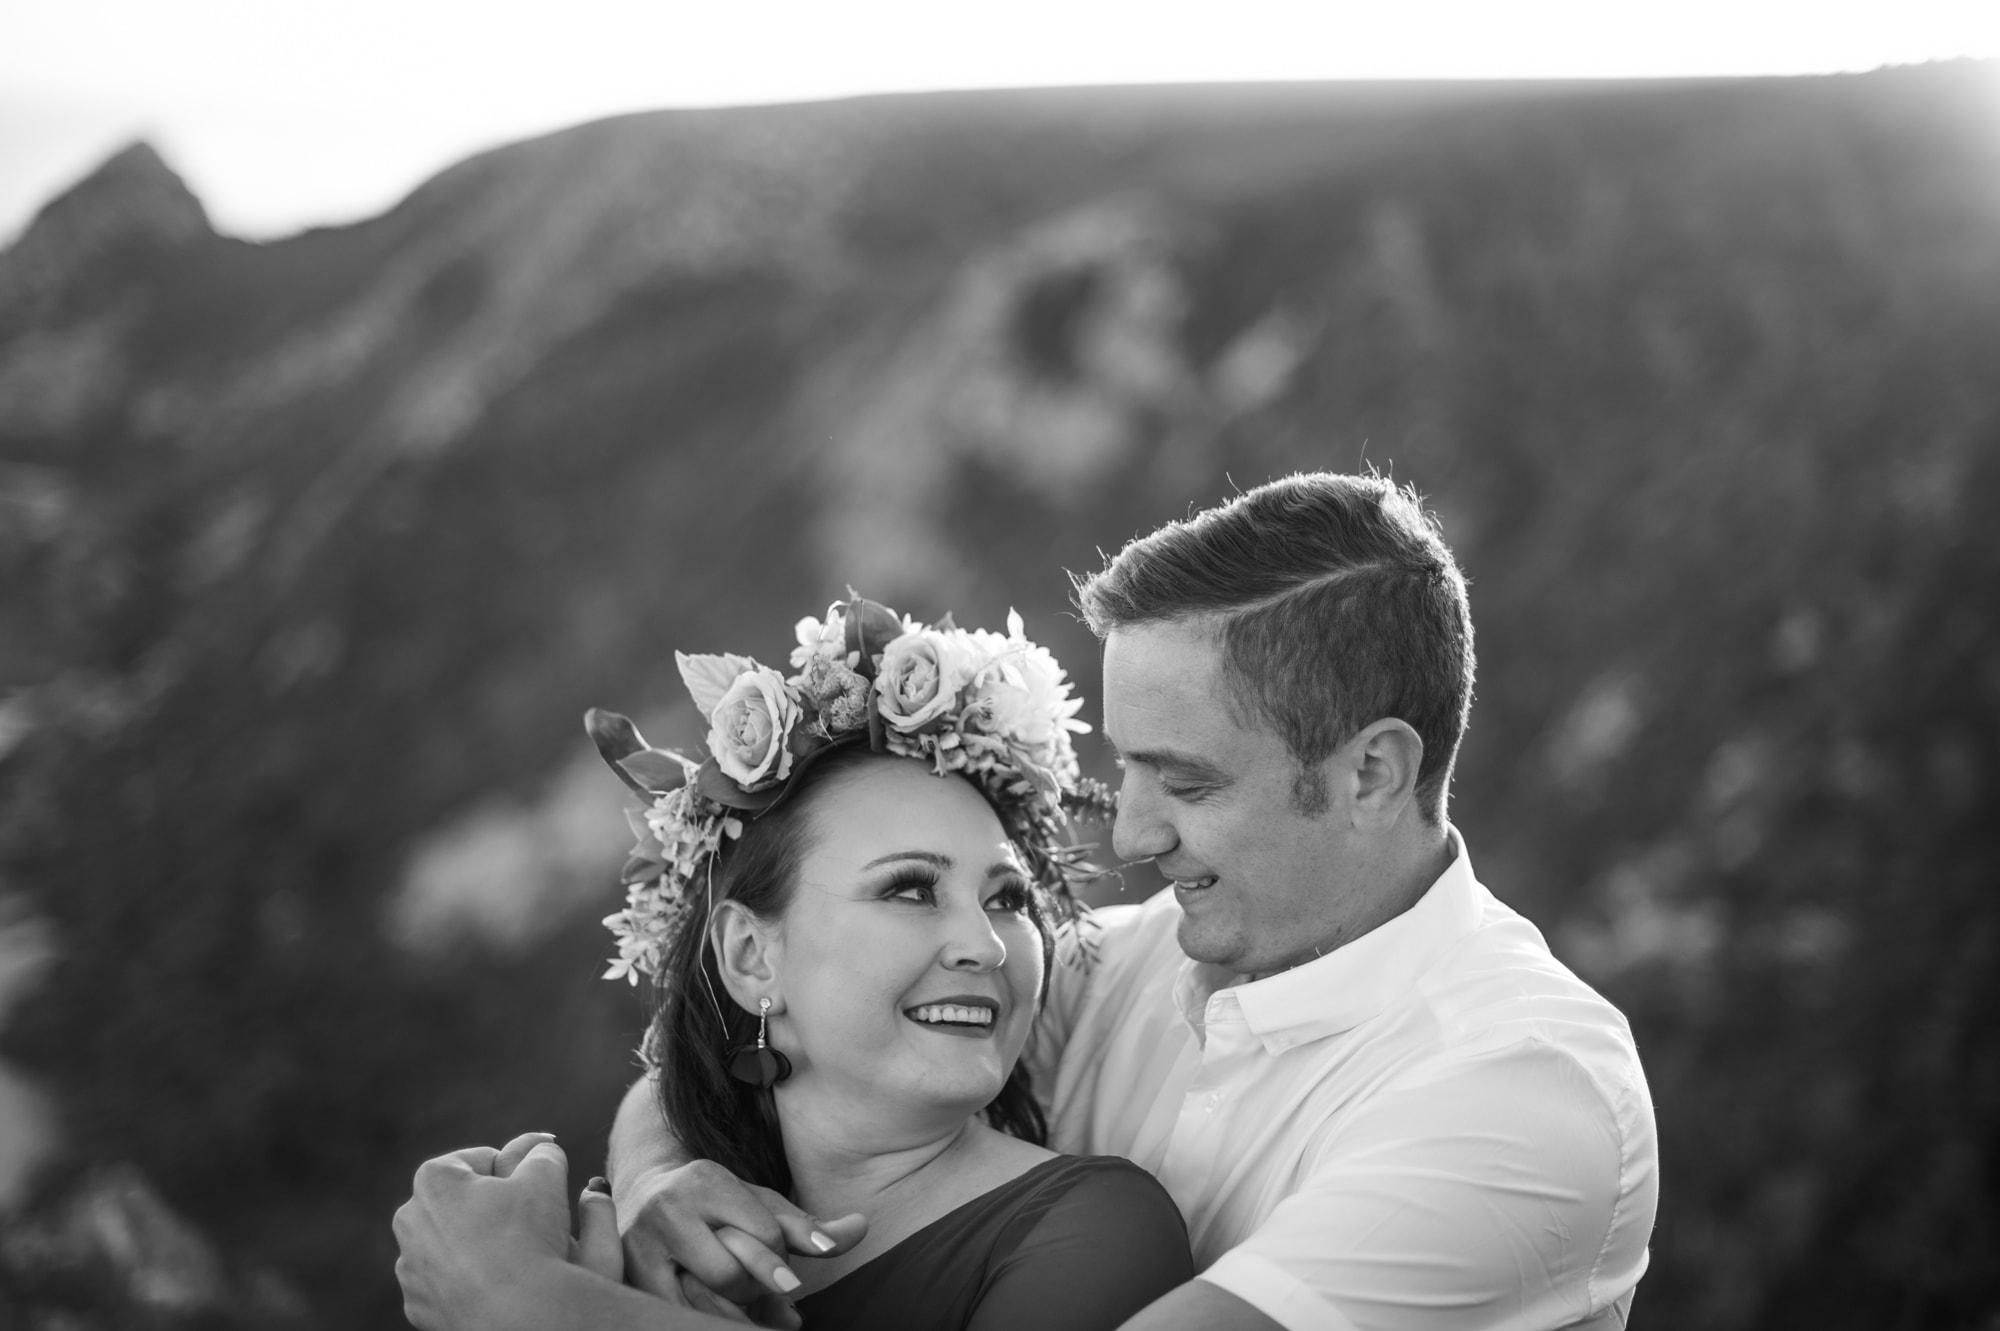 jesann-freddie-kranshoek-engagement-June-Richards-Photography-Destination-Weddings-Elopements-Garden-Route-45